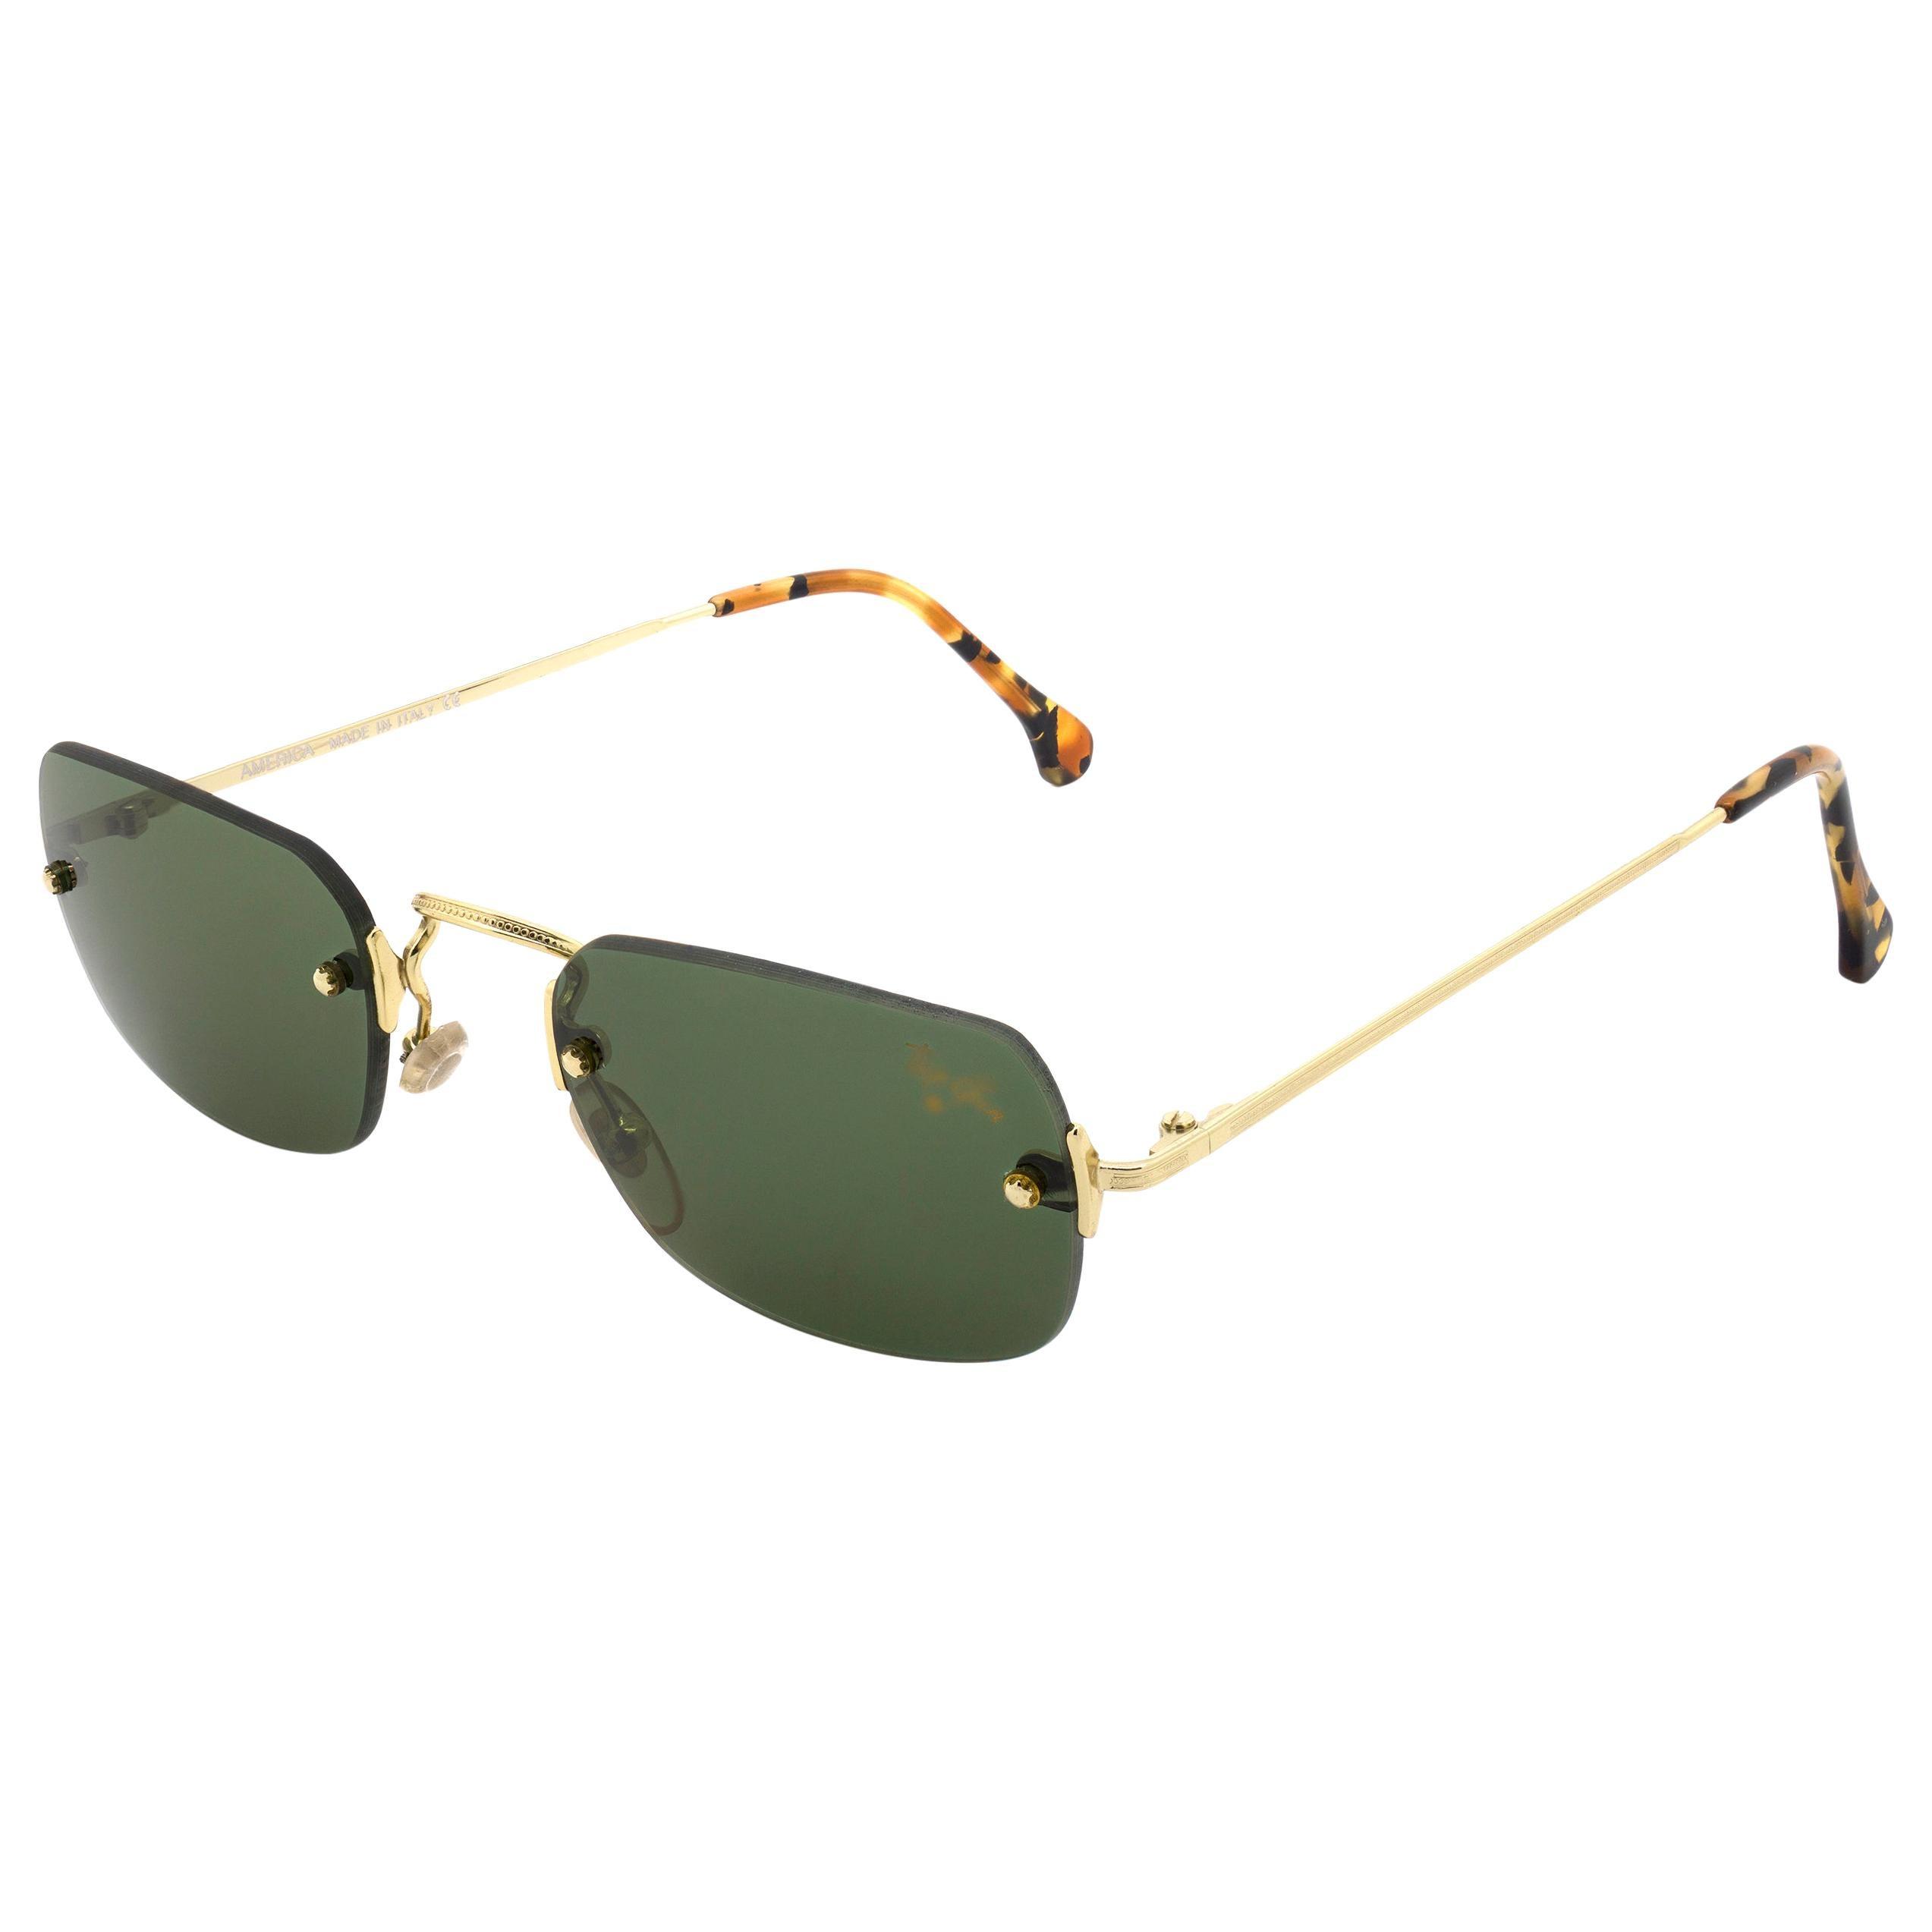 Top Gun® rectangular rimless vintage sunglasses, Italy 90s